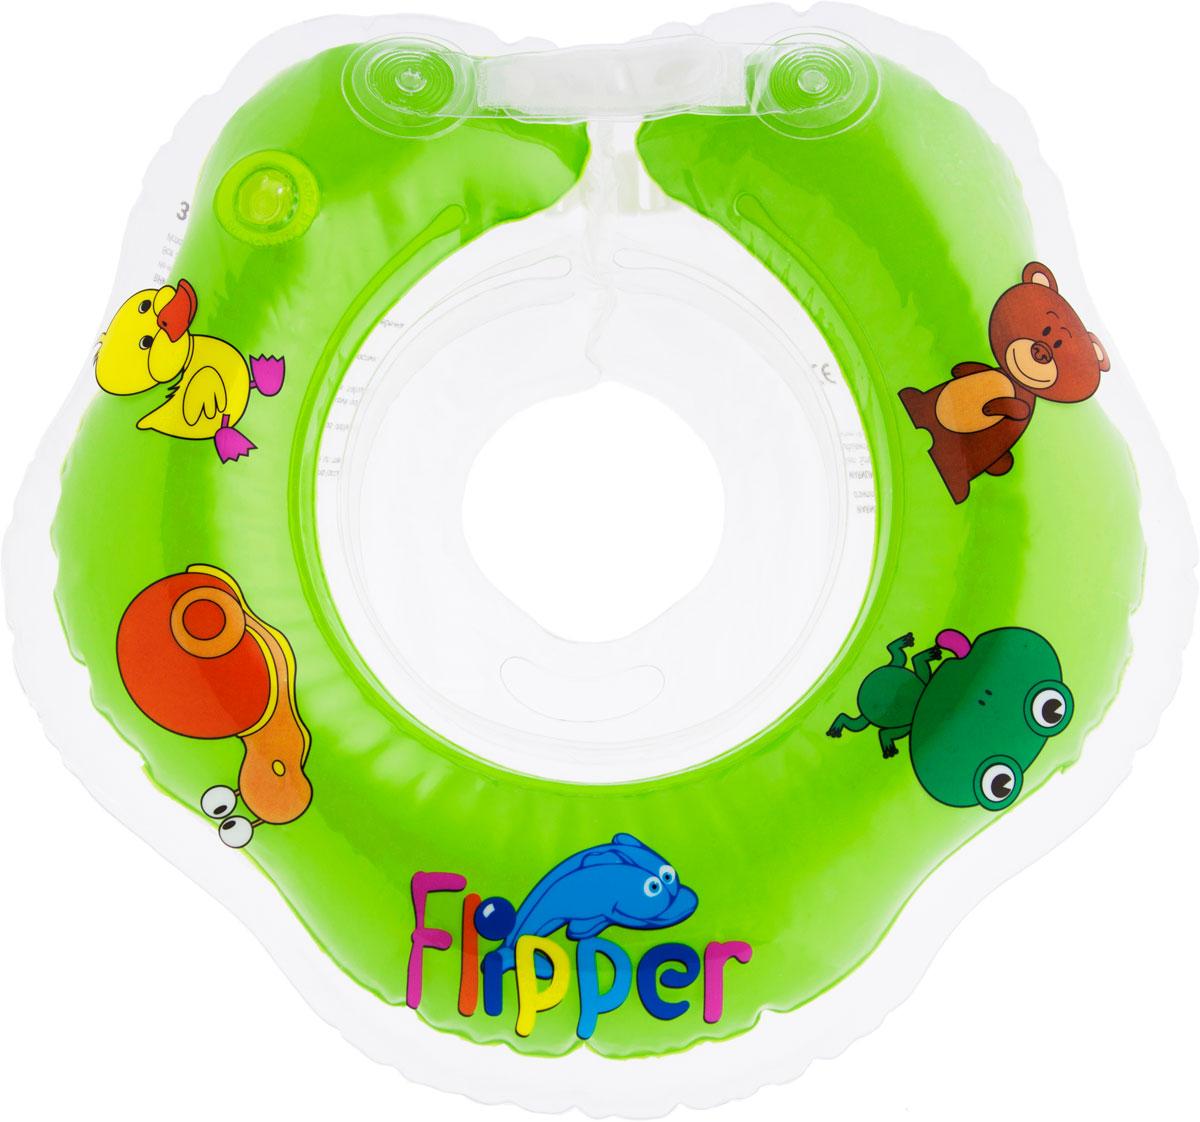 Круг на шею для купания Roxy-Kids Flipper, цвет: зеленый круг для купания roxy kids flipper рыцарь fl006